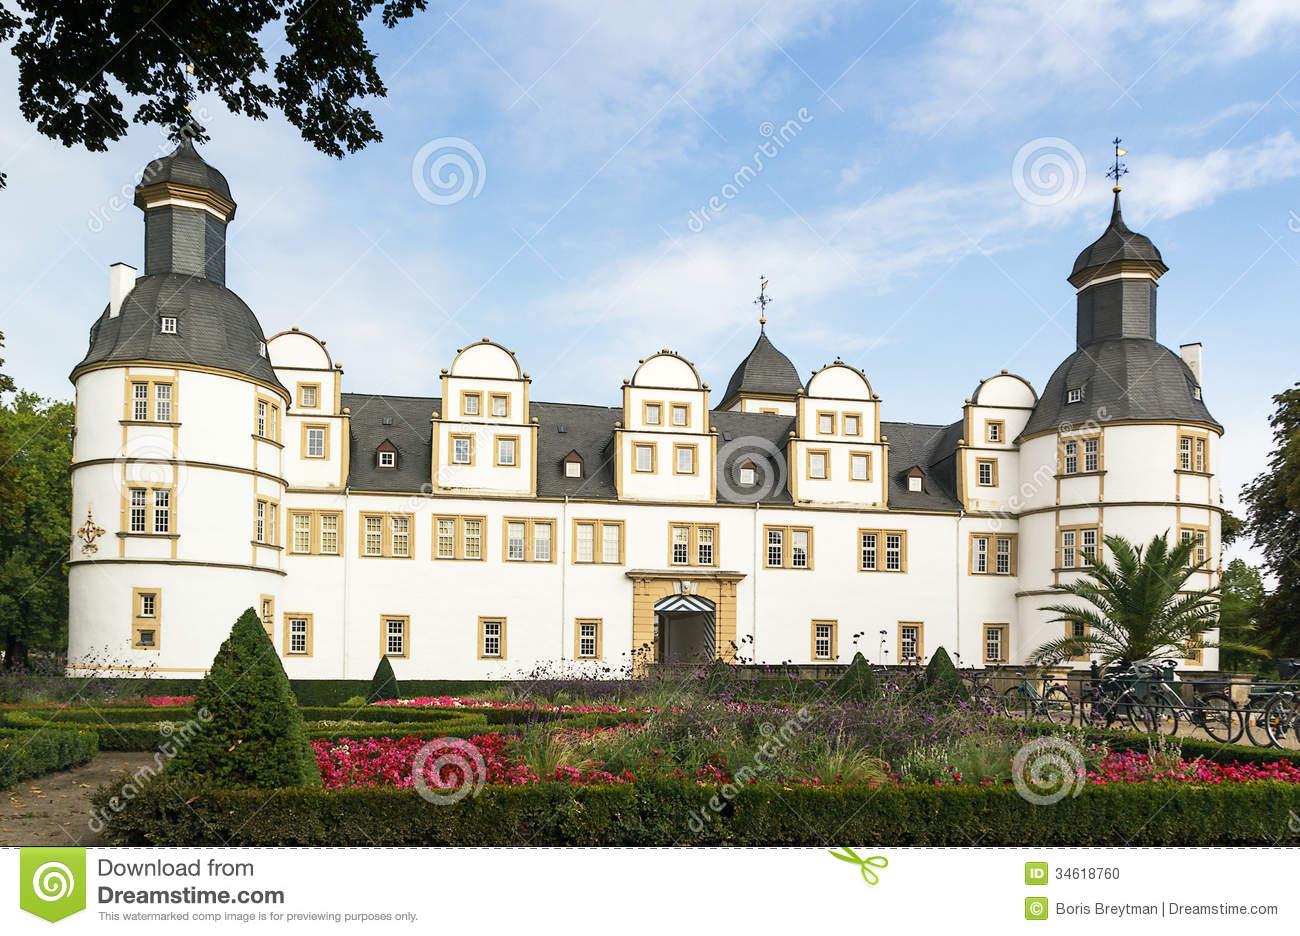 Neuhaus Castle In Paderborn, Germany Stock Photo.